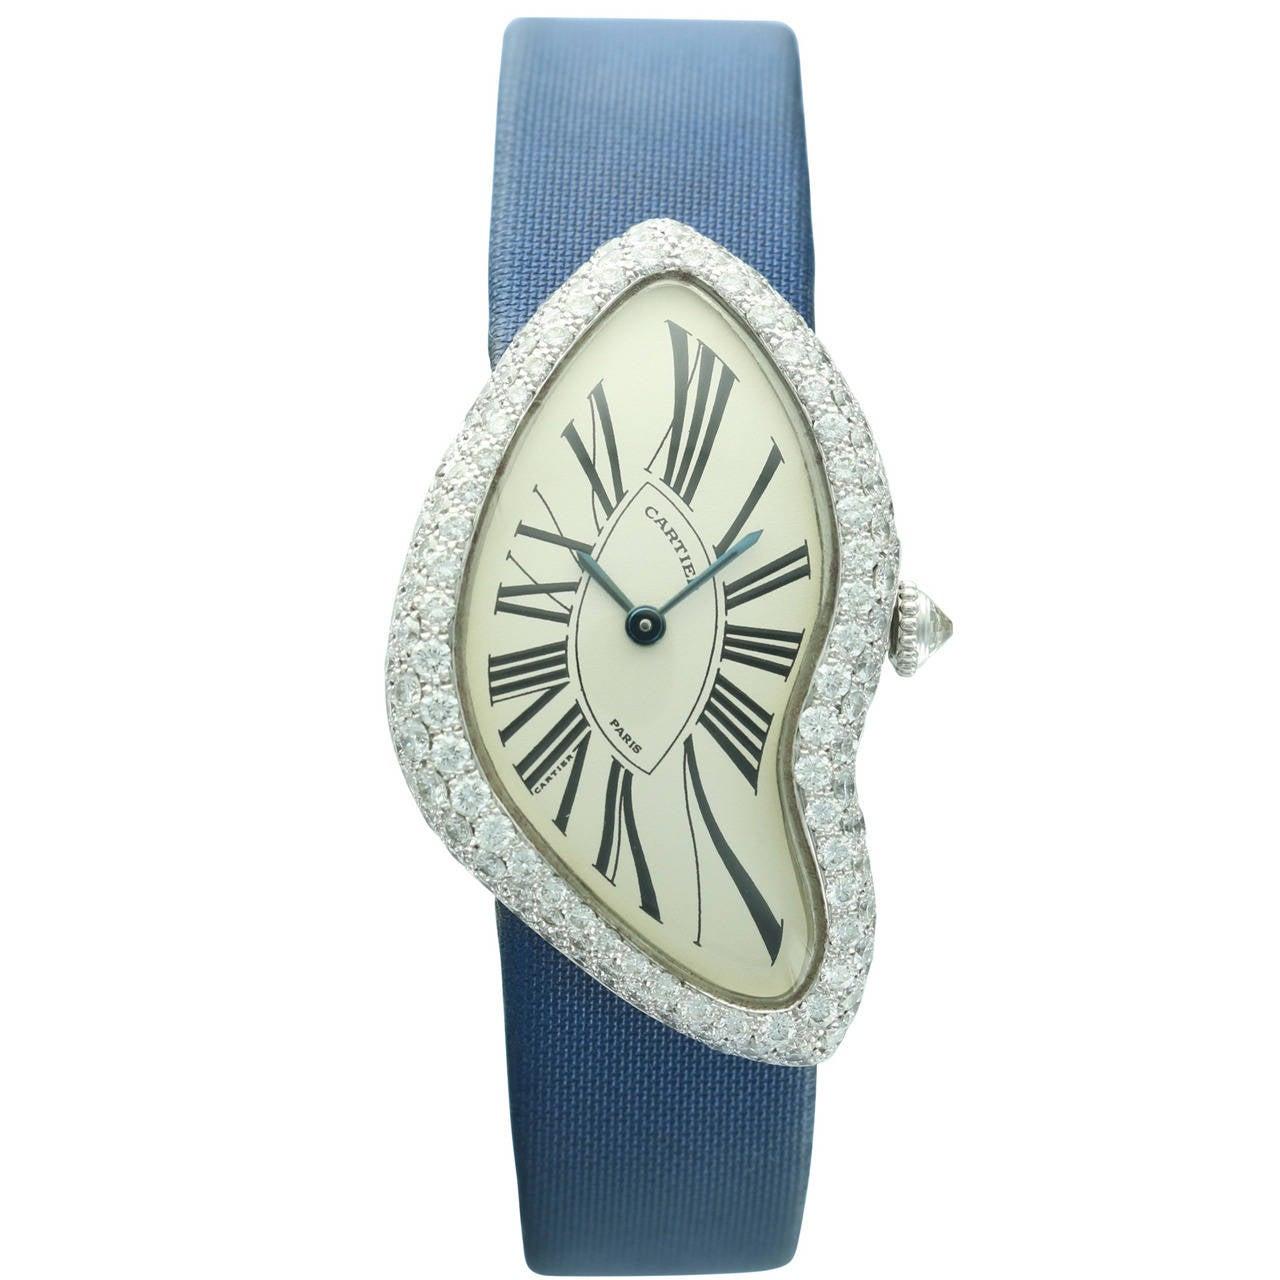 Cartier White Gold Crash Diamond Bezel Wristwatch 1